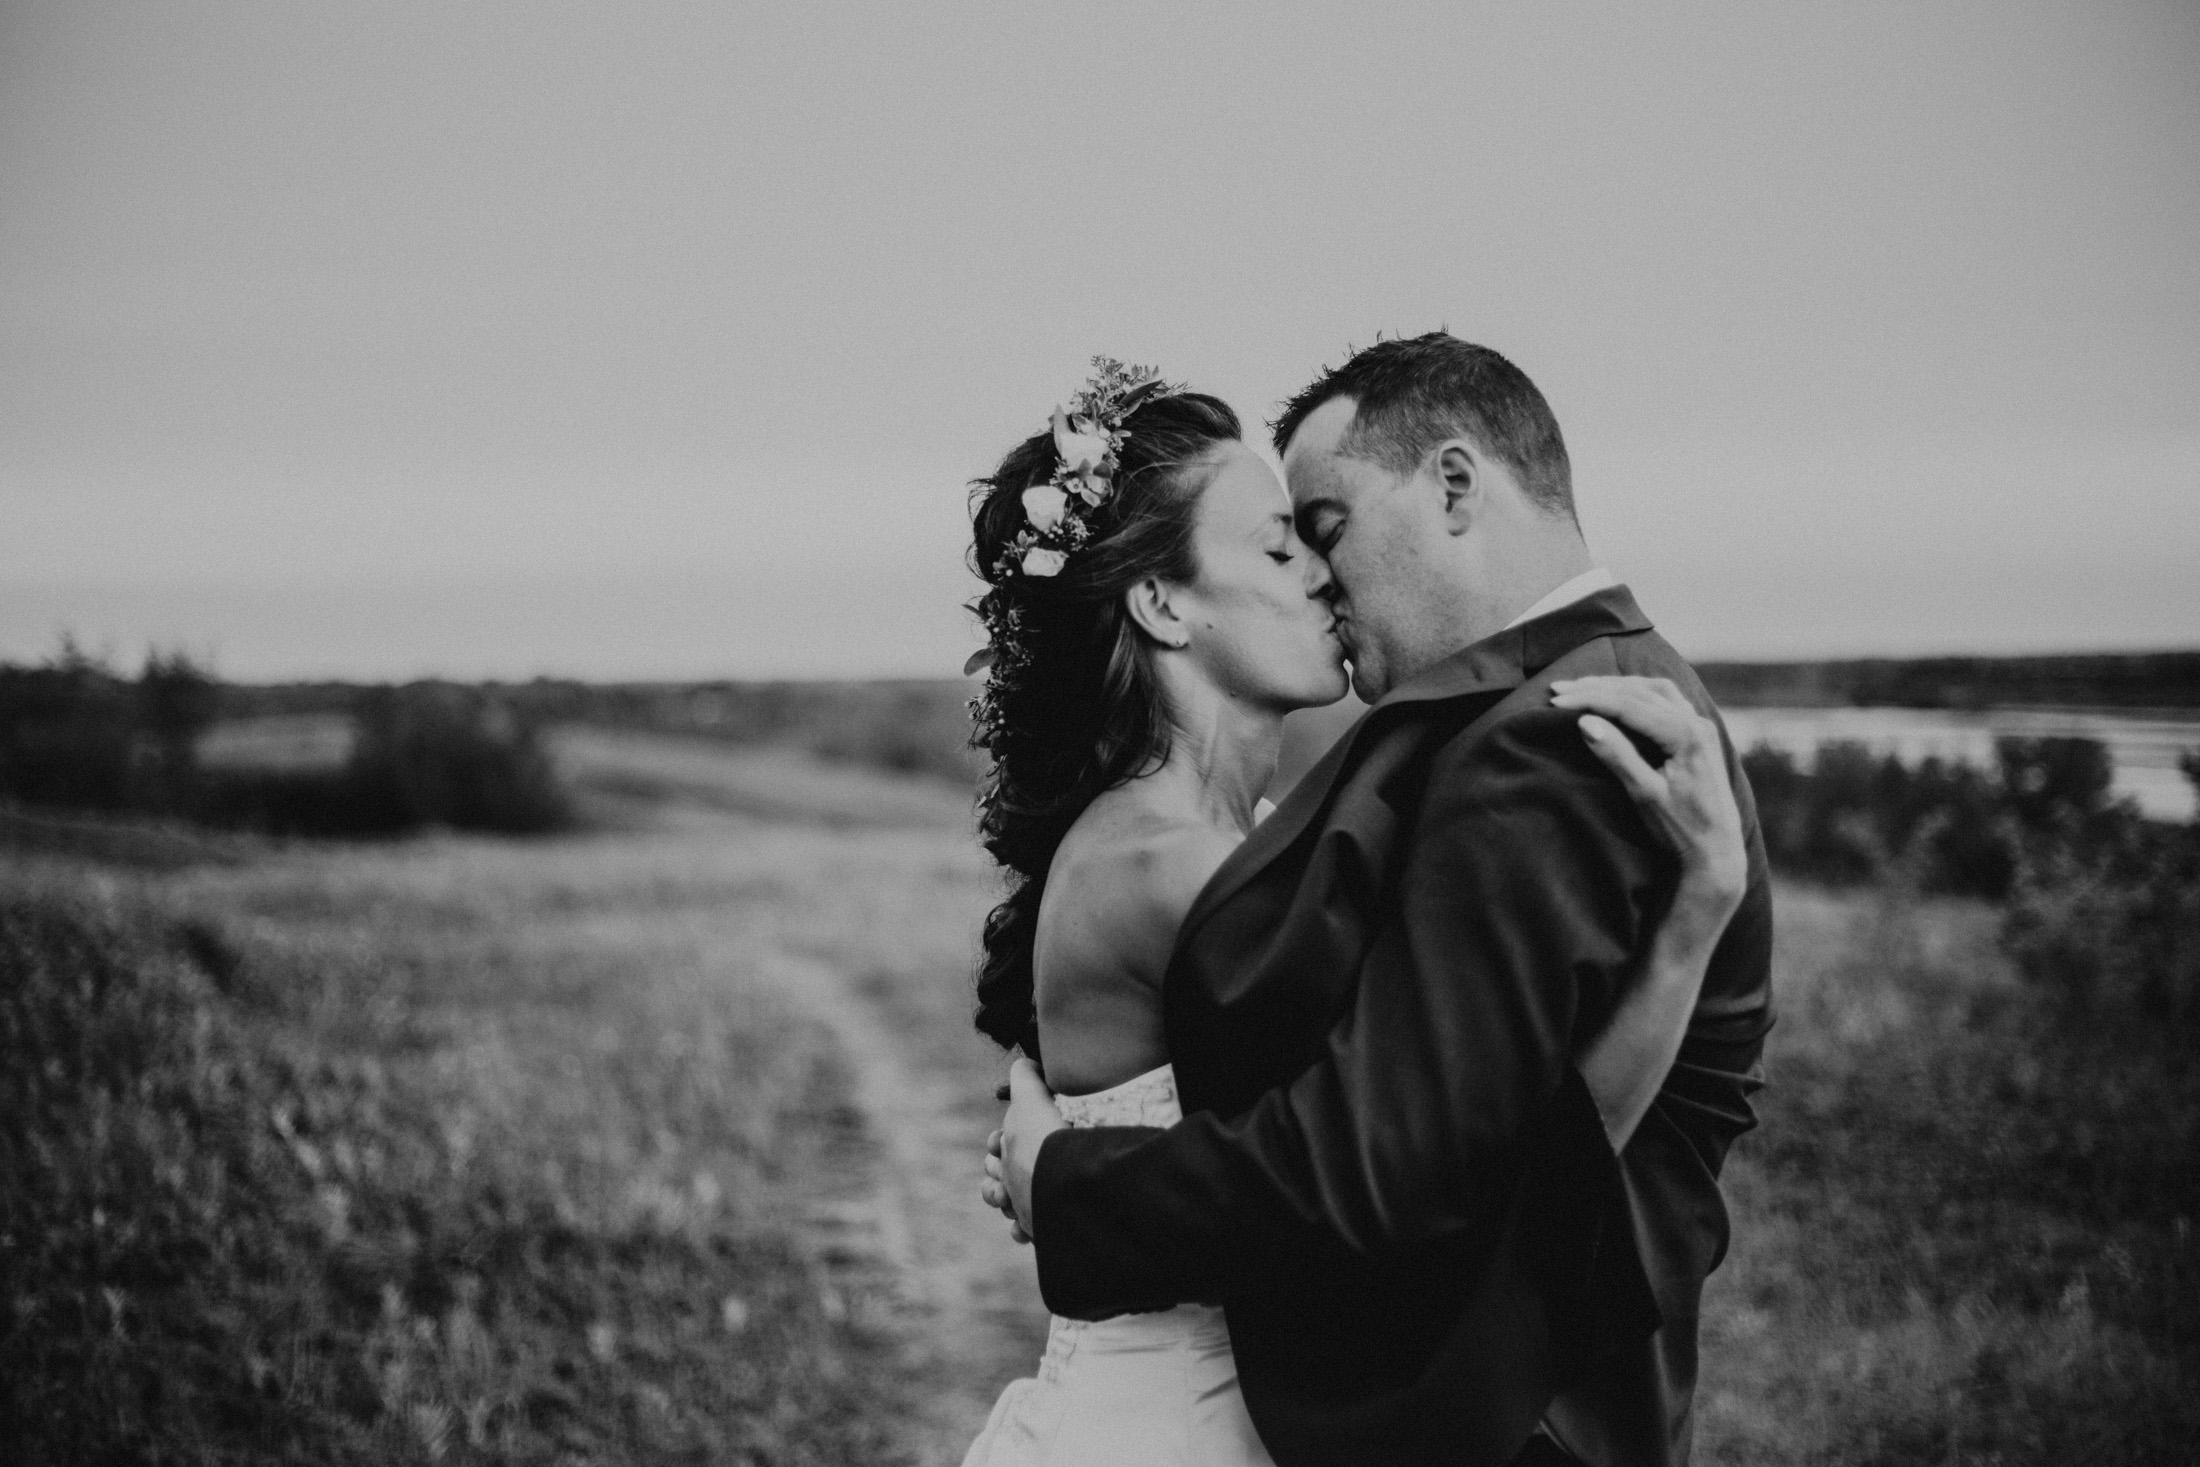 EnsoulEndearmentImagery-WeddingAnniversary-CranberryFlatsSaskatoon-7861.jpg